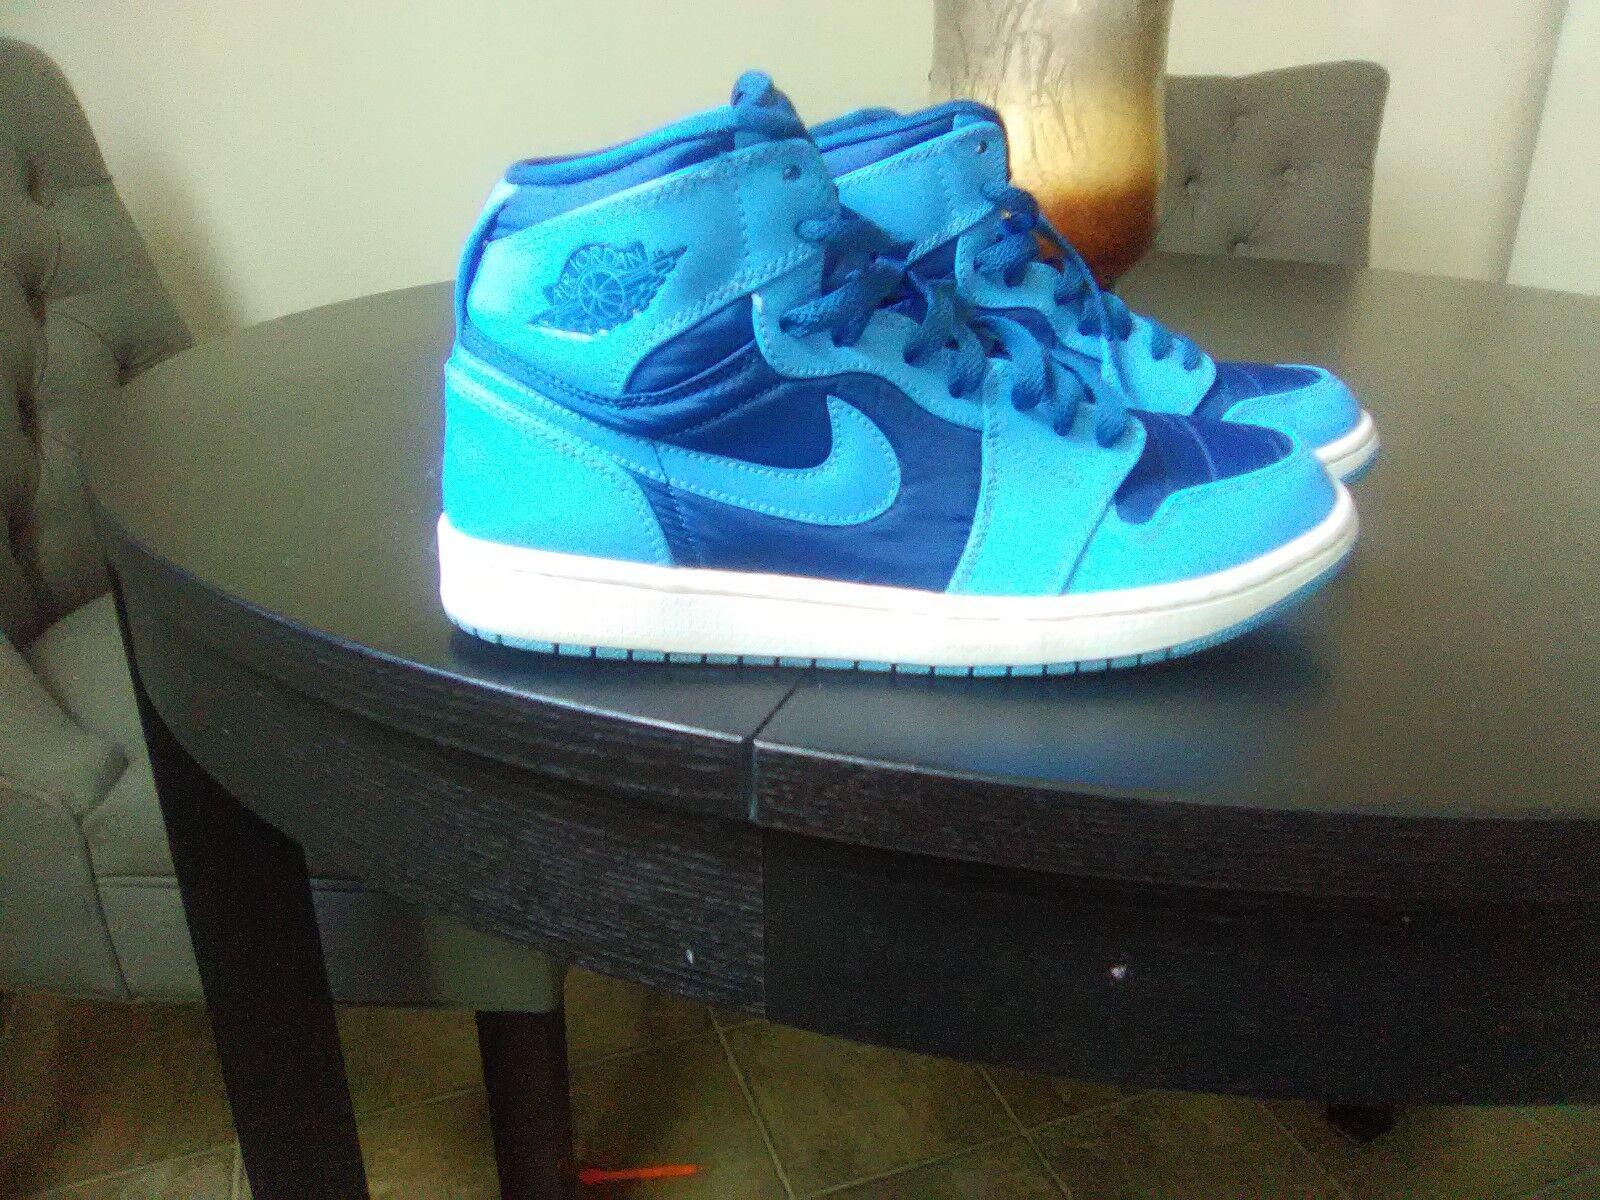 Nike Air Jordan 1 High tops French bluee University bluee Carolina UNC Size 8.5